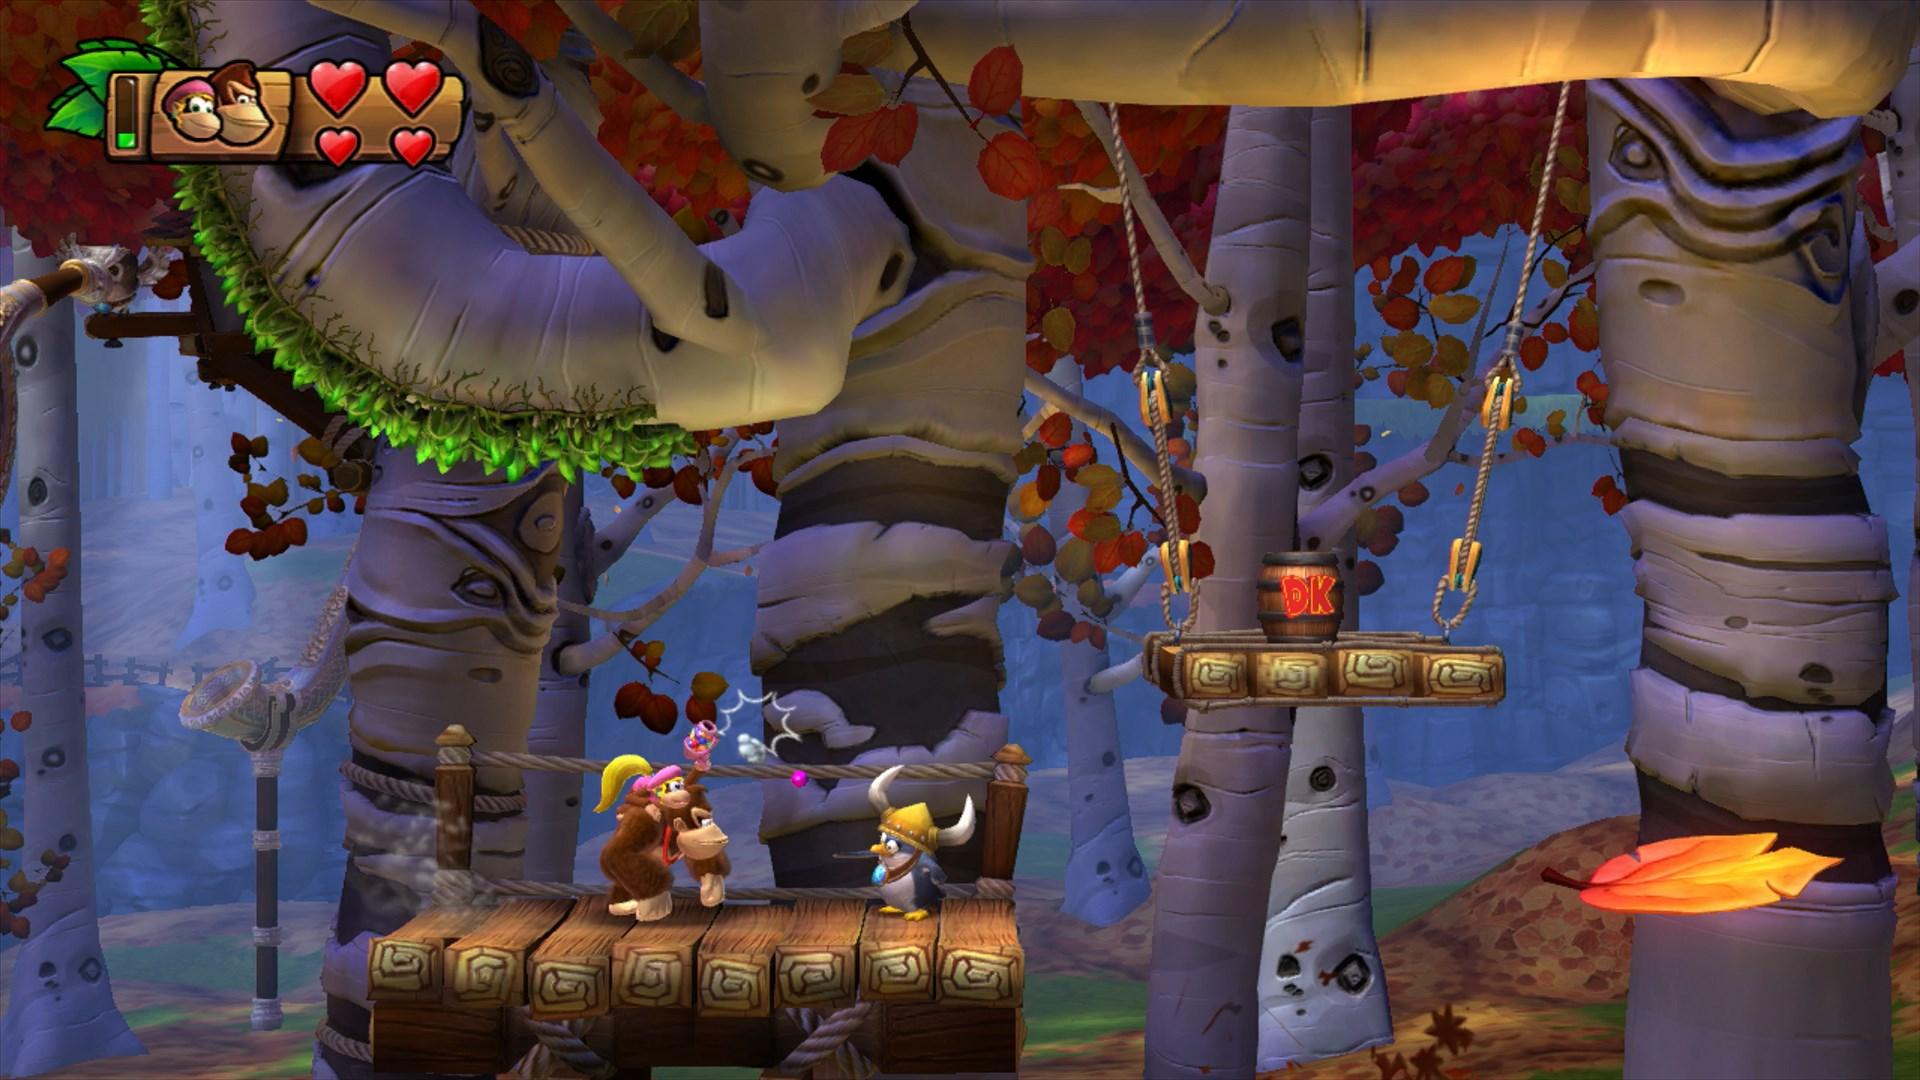 Donkey Kong Country Tropical Freeze Screenshot 5 - Just ...